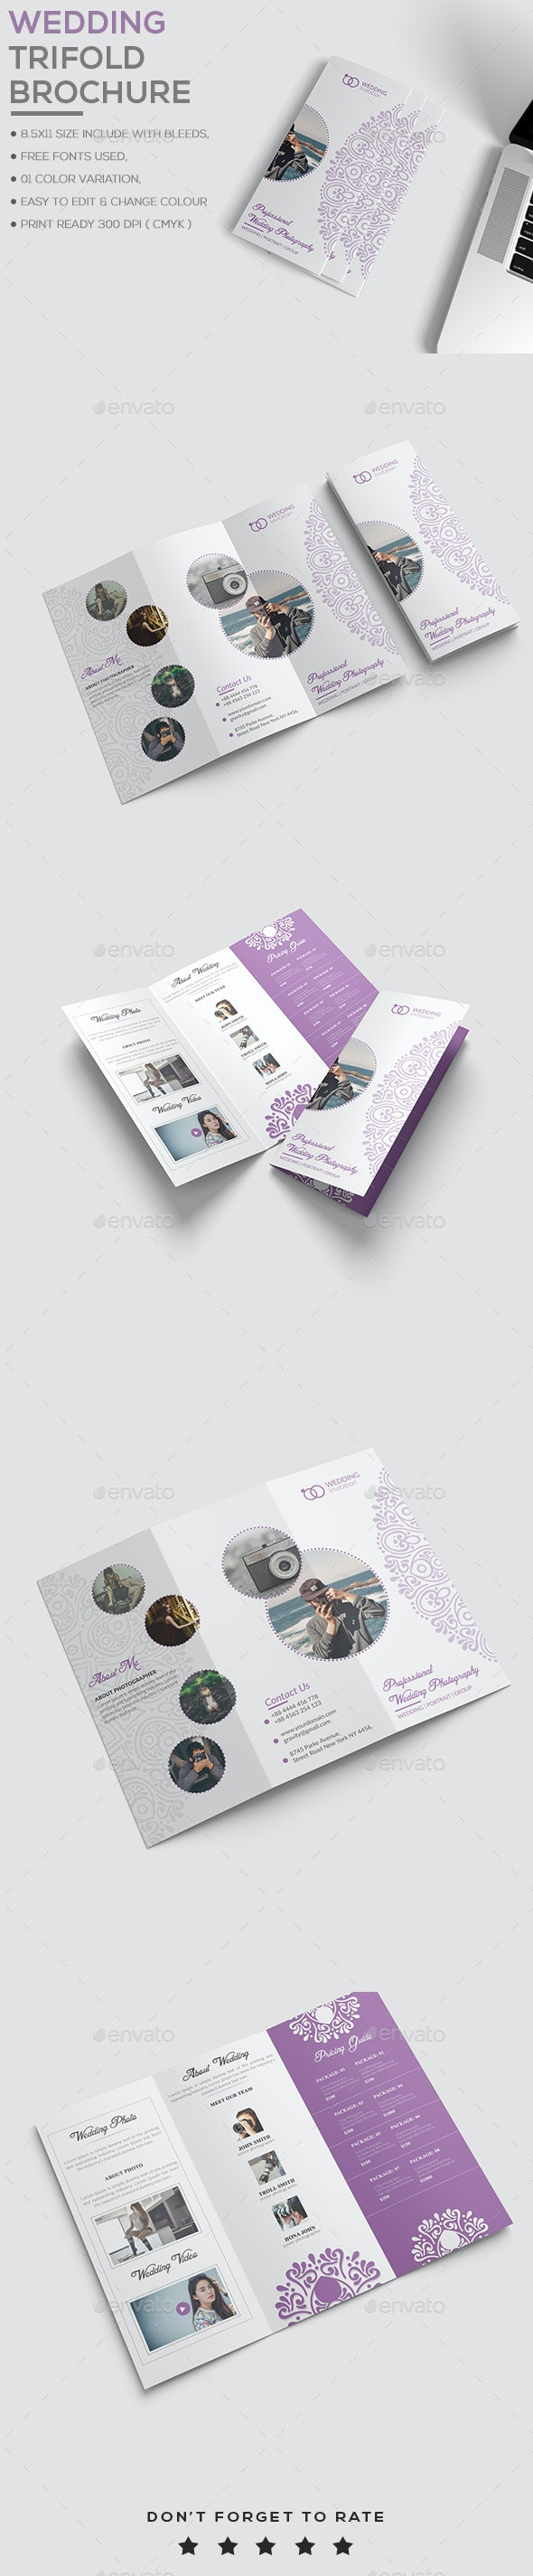 Wedding Trifold Brochure - Brochures Print Templates